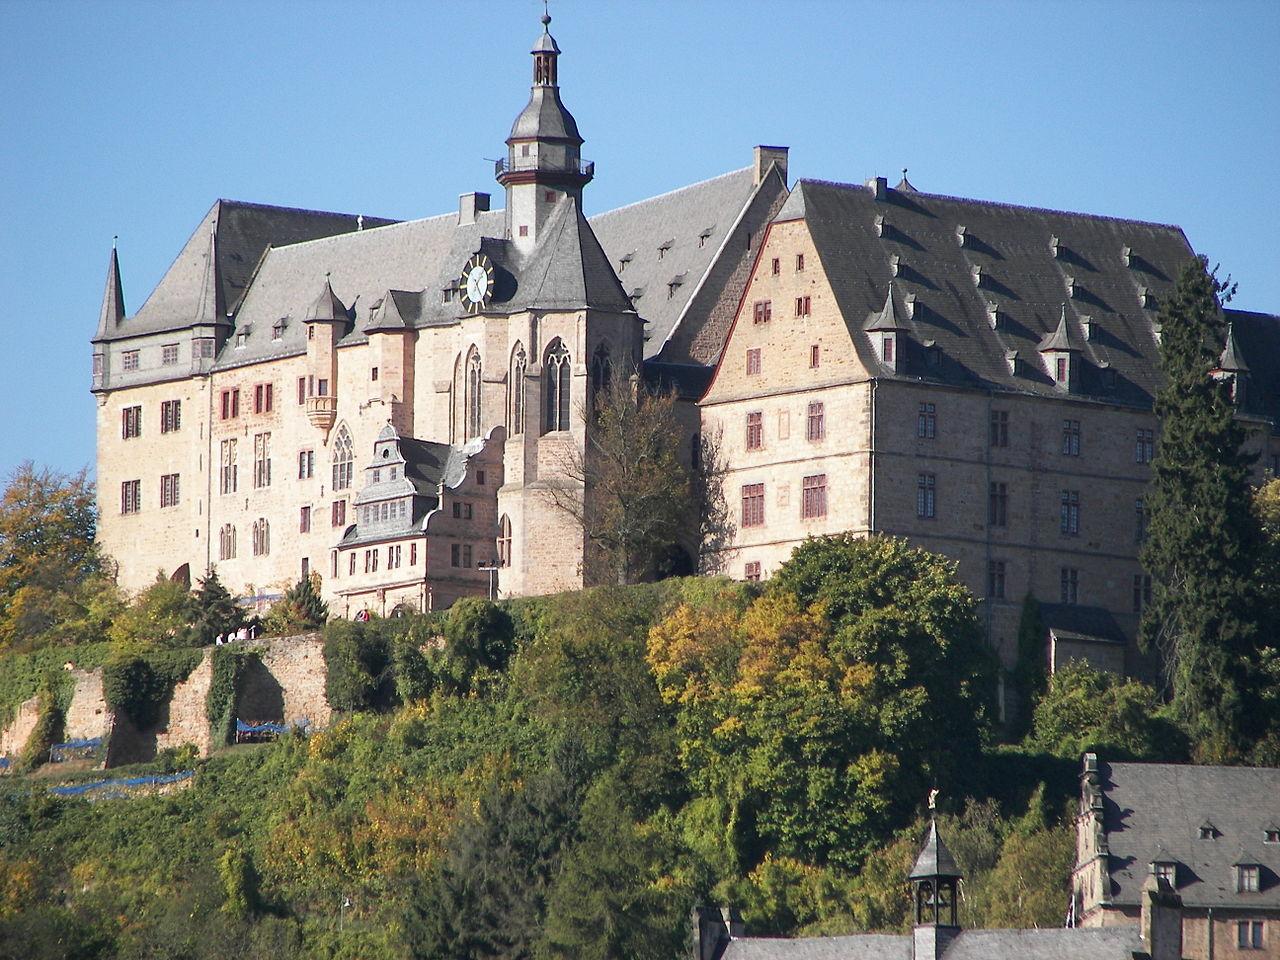 Bild Marburger Schloss